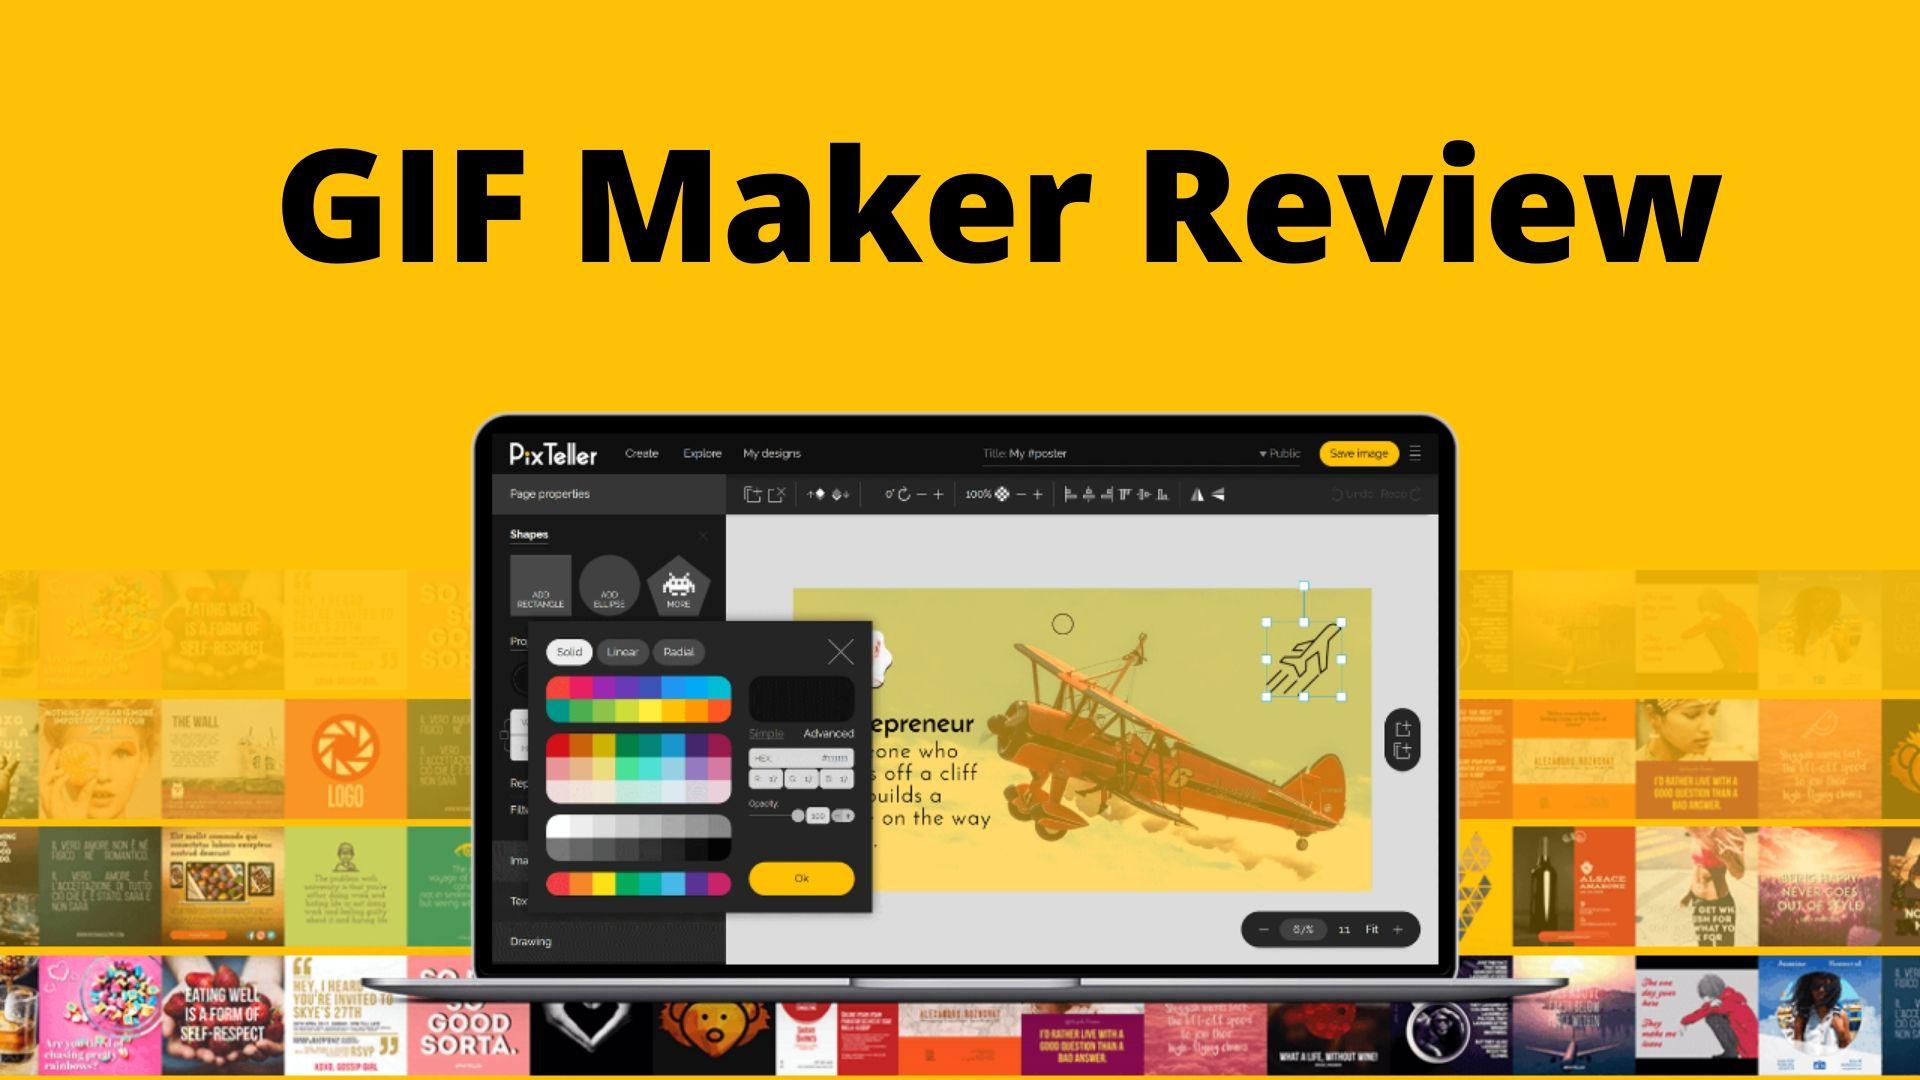 GIF Maker